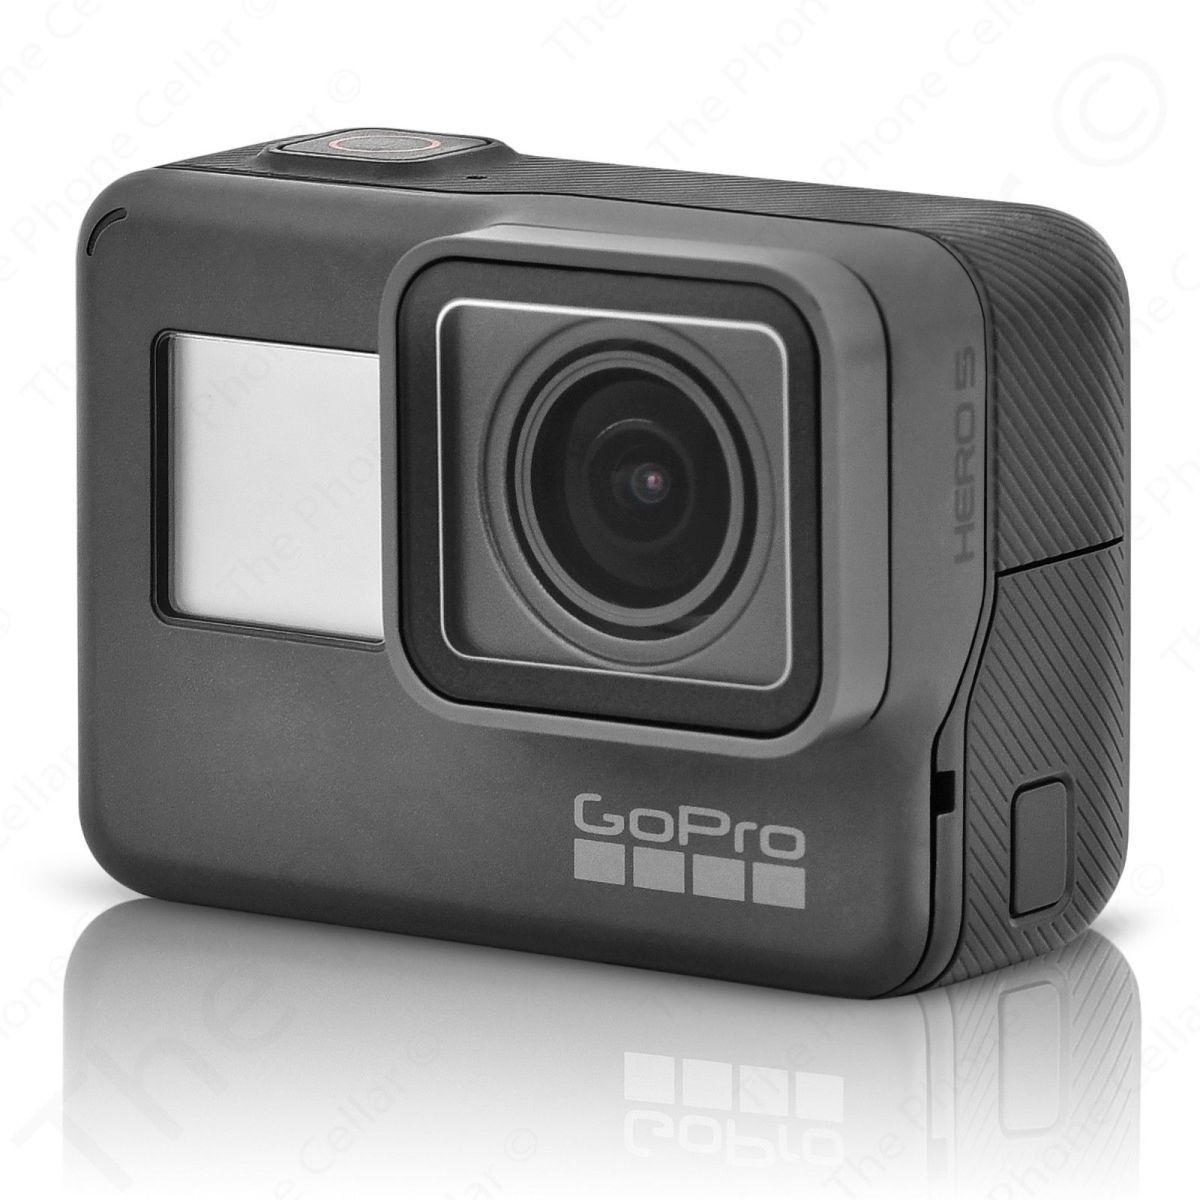 Gopro Hero 5 Black 4k Action Camera Hd Camcorder Chdhx 502 Hd Camcorder Action Camera Gopro Hero 5